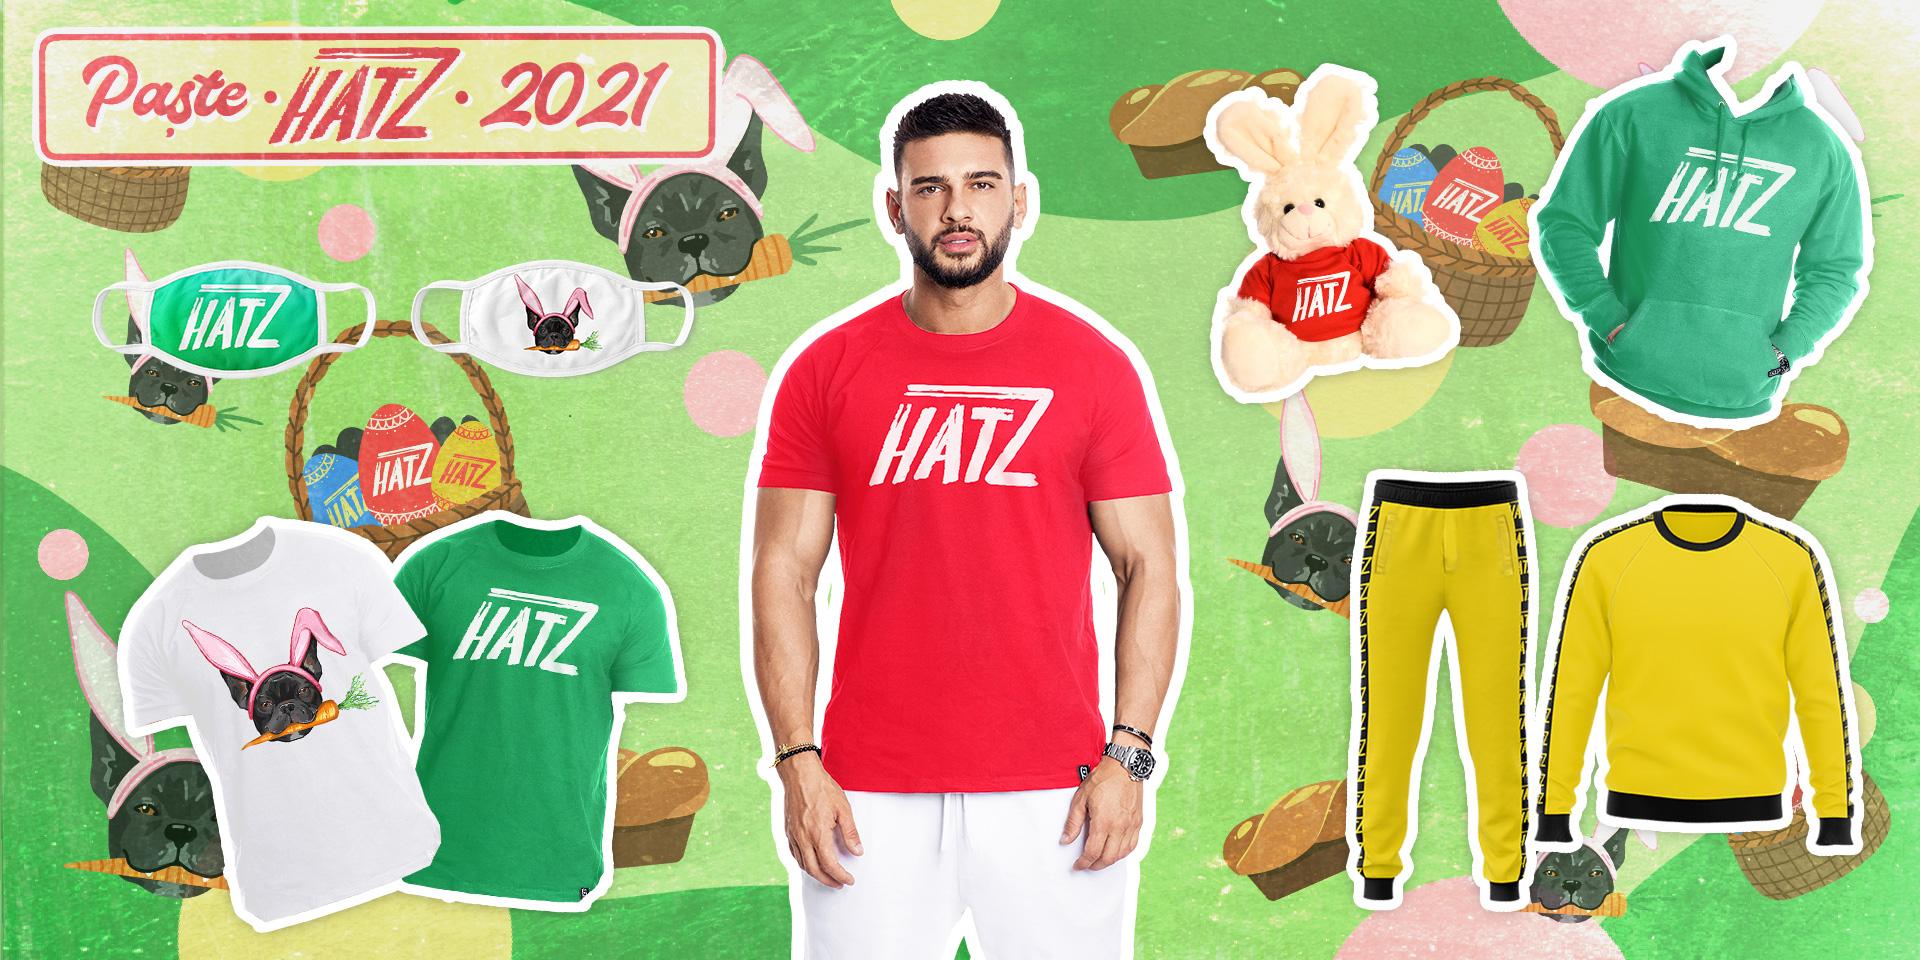 Paste HATZ 2021